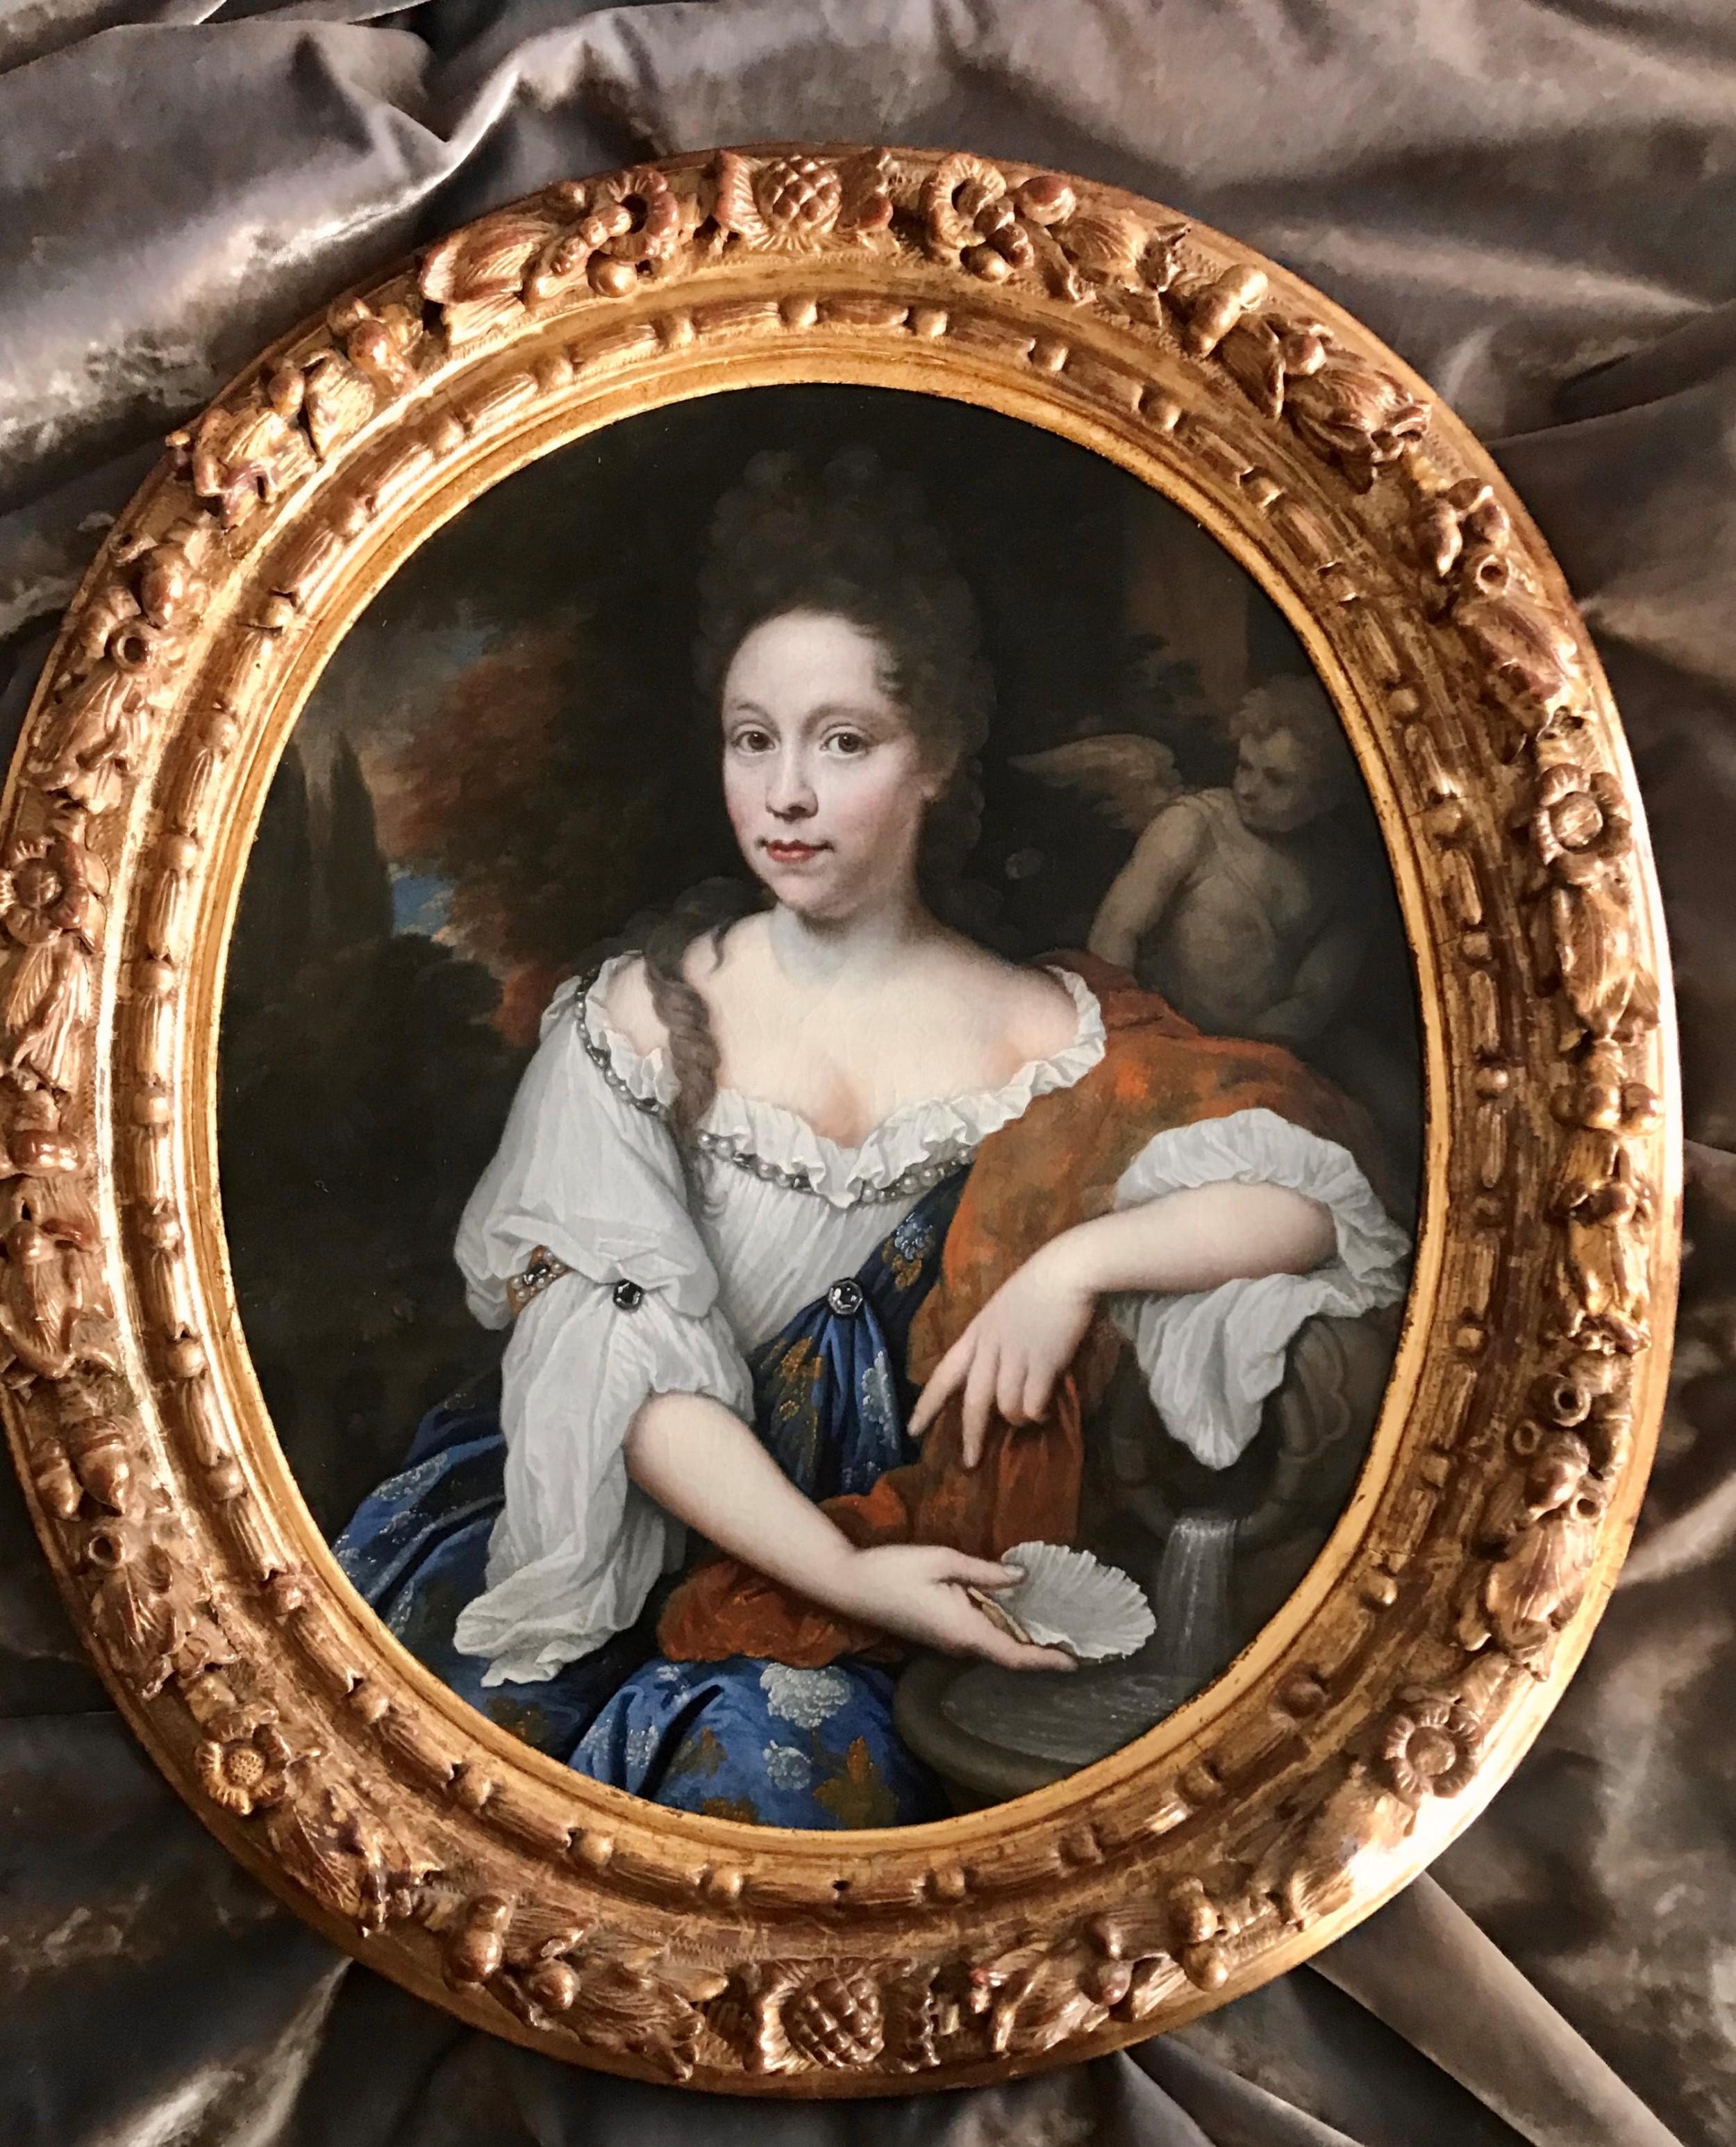 portrait of catharina margaretha beck c1695 attributed to johannes van haensbergen